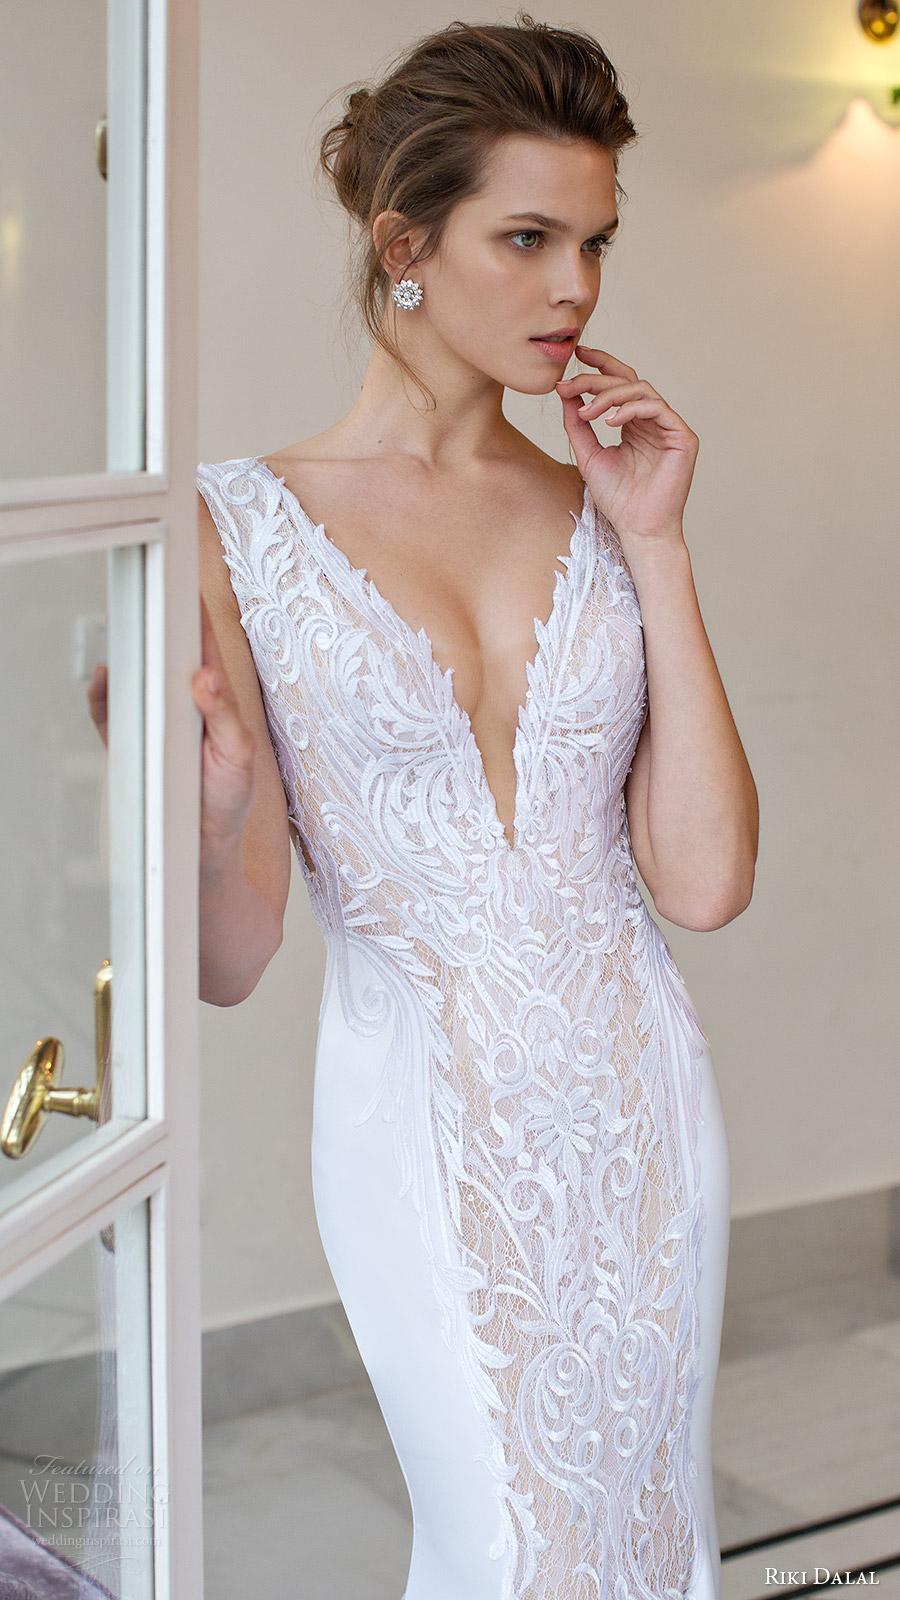 riki dalal bridal 2016 sleeveless deep vneck thick straps embroidered bodice sheath wedding dress (1813) zv elegant glam